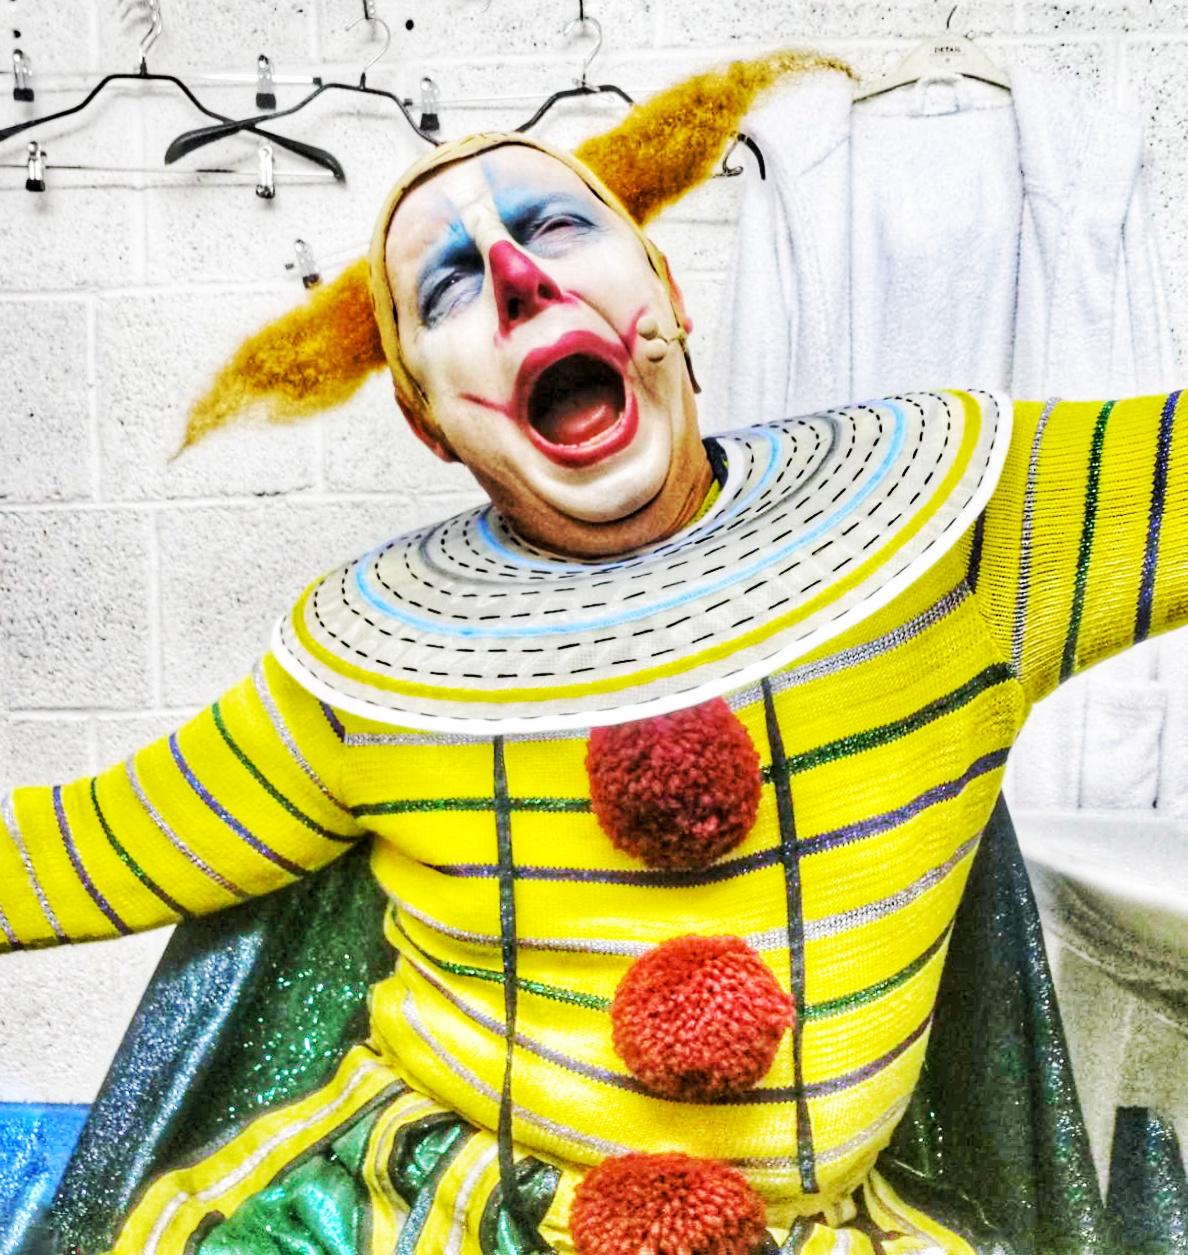 Vladimir Stoyanov in Rigoletto costume, Bregenz 2021